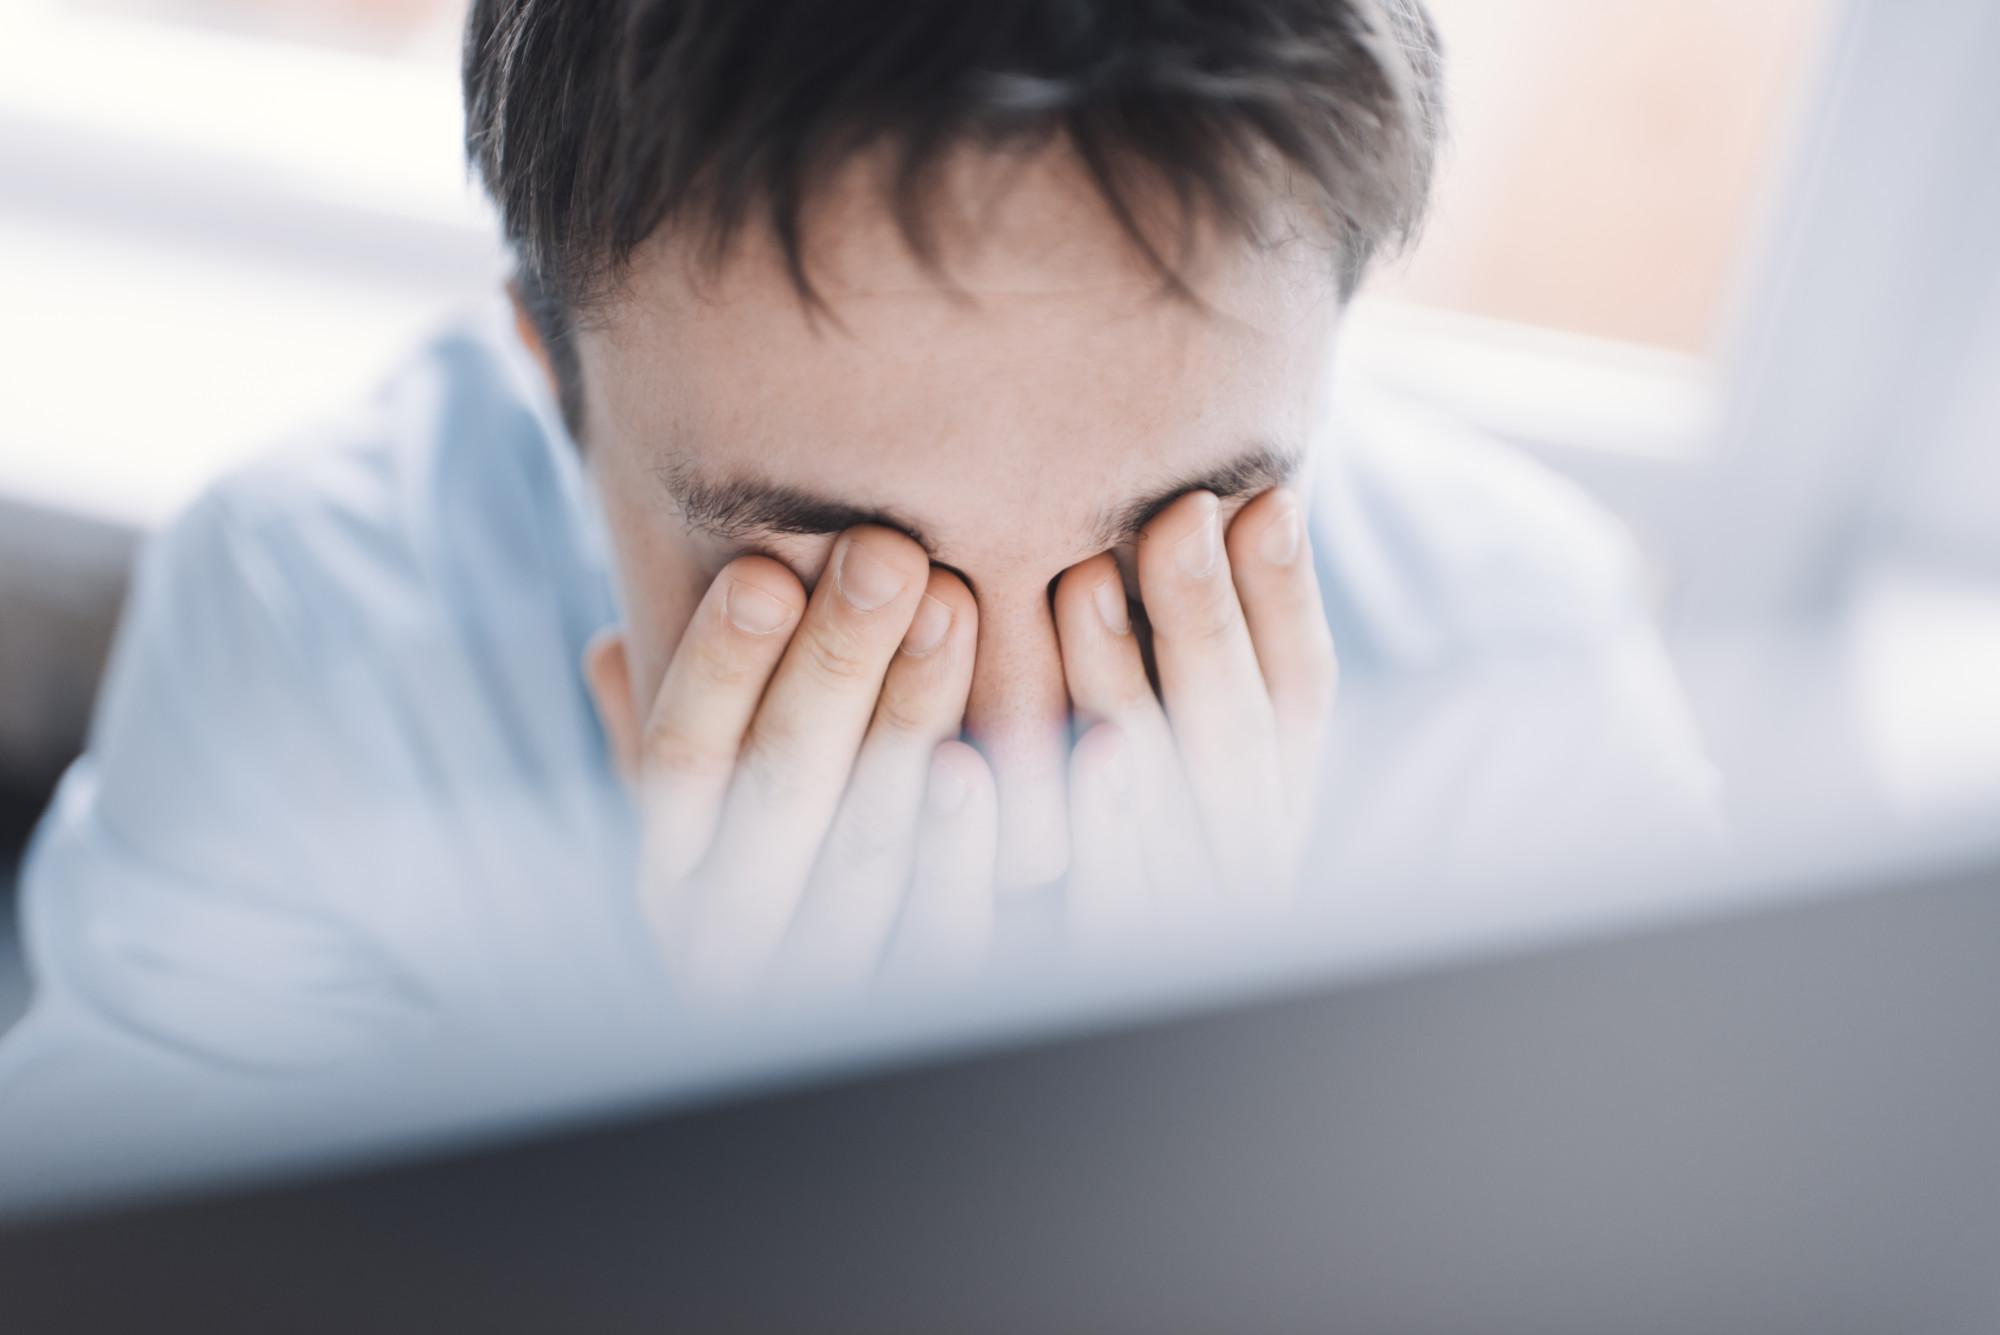 overworked symptoms